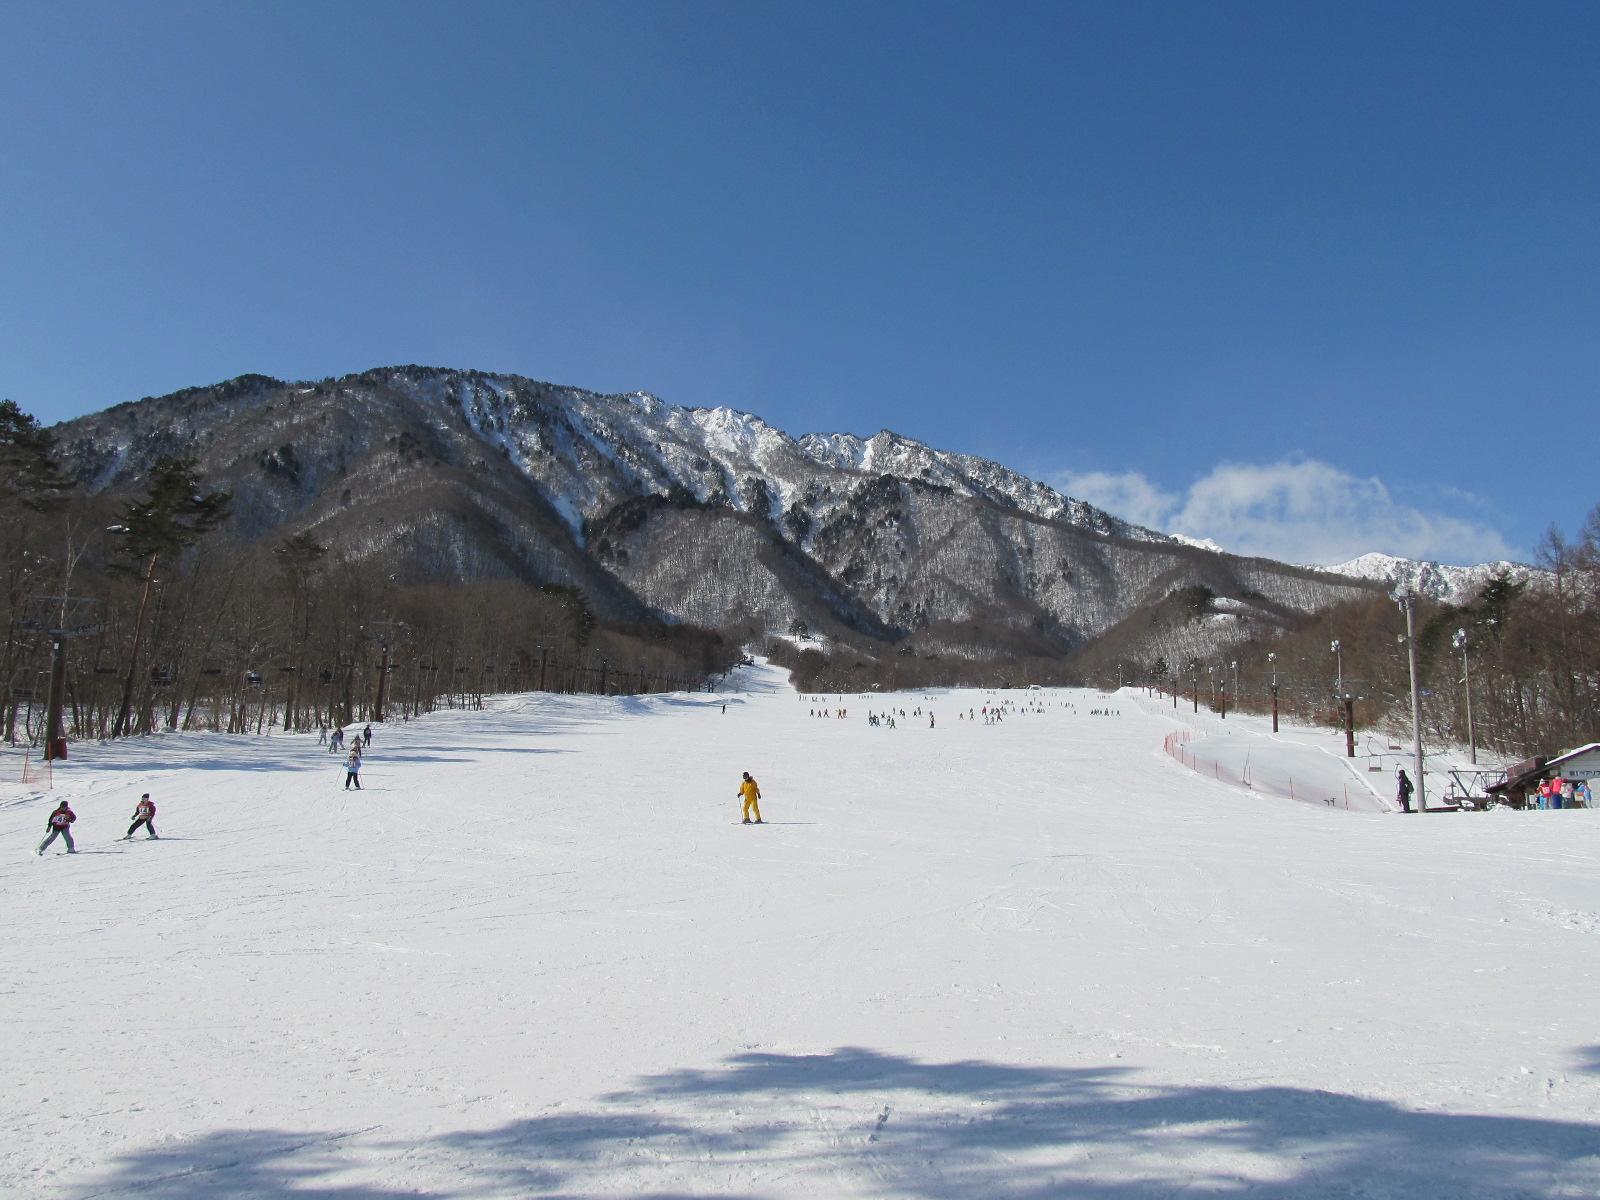 Jiigatake